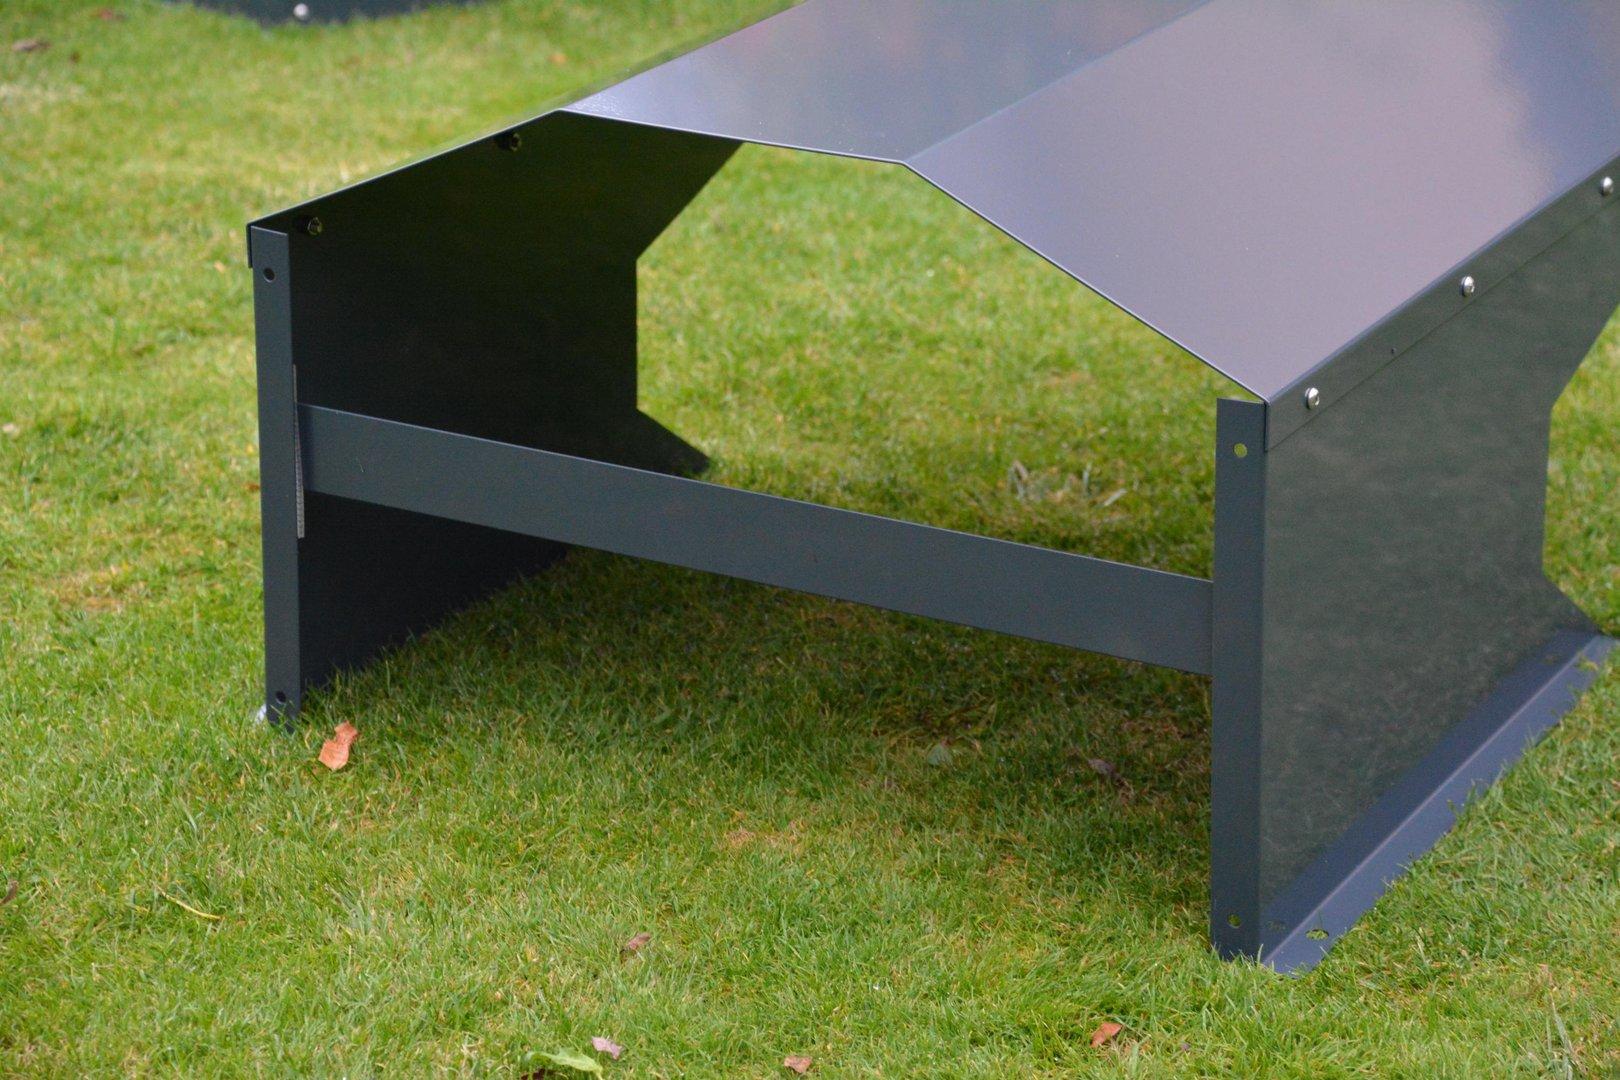 m hroboter garage hausdach farbe nach farbkarte alles. Black Bedroom Furniture Sets. Home Design Ideas